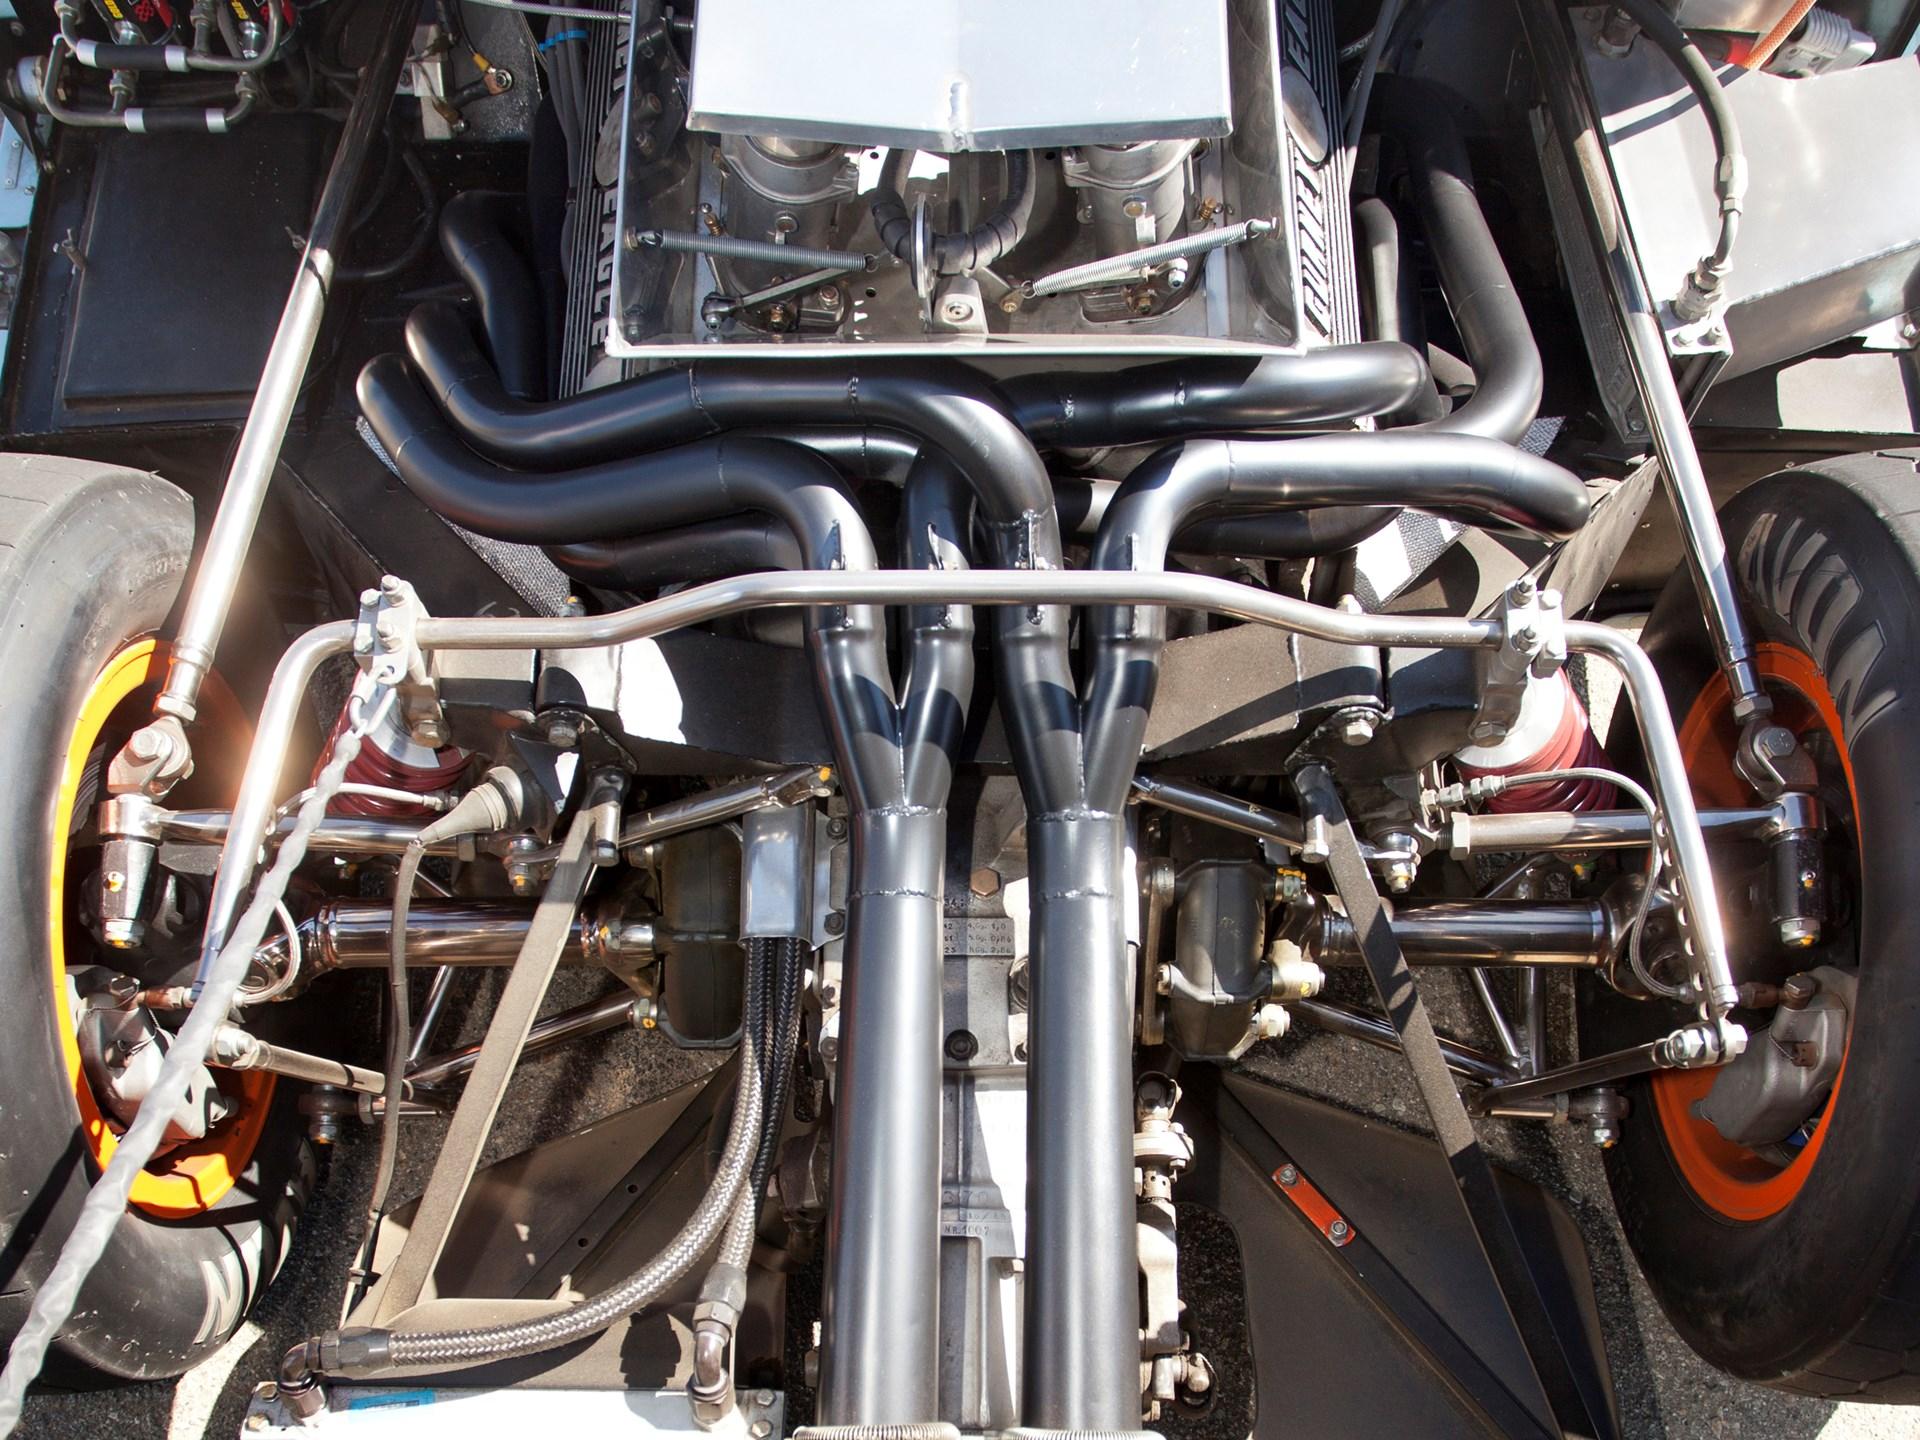 1968 Ford GT40 Gulf/Mirage Lightweight Racing Car